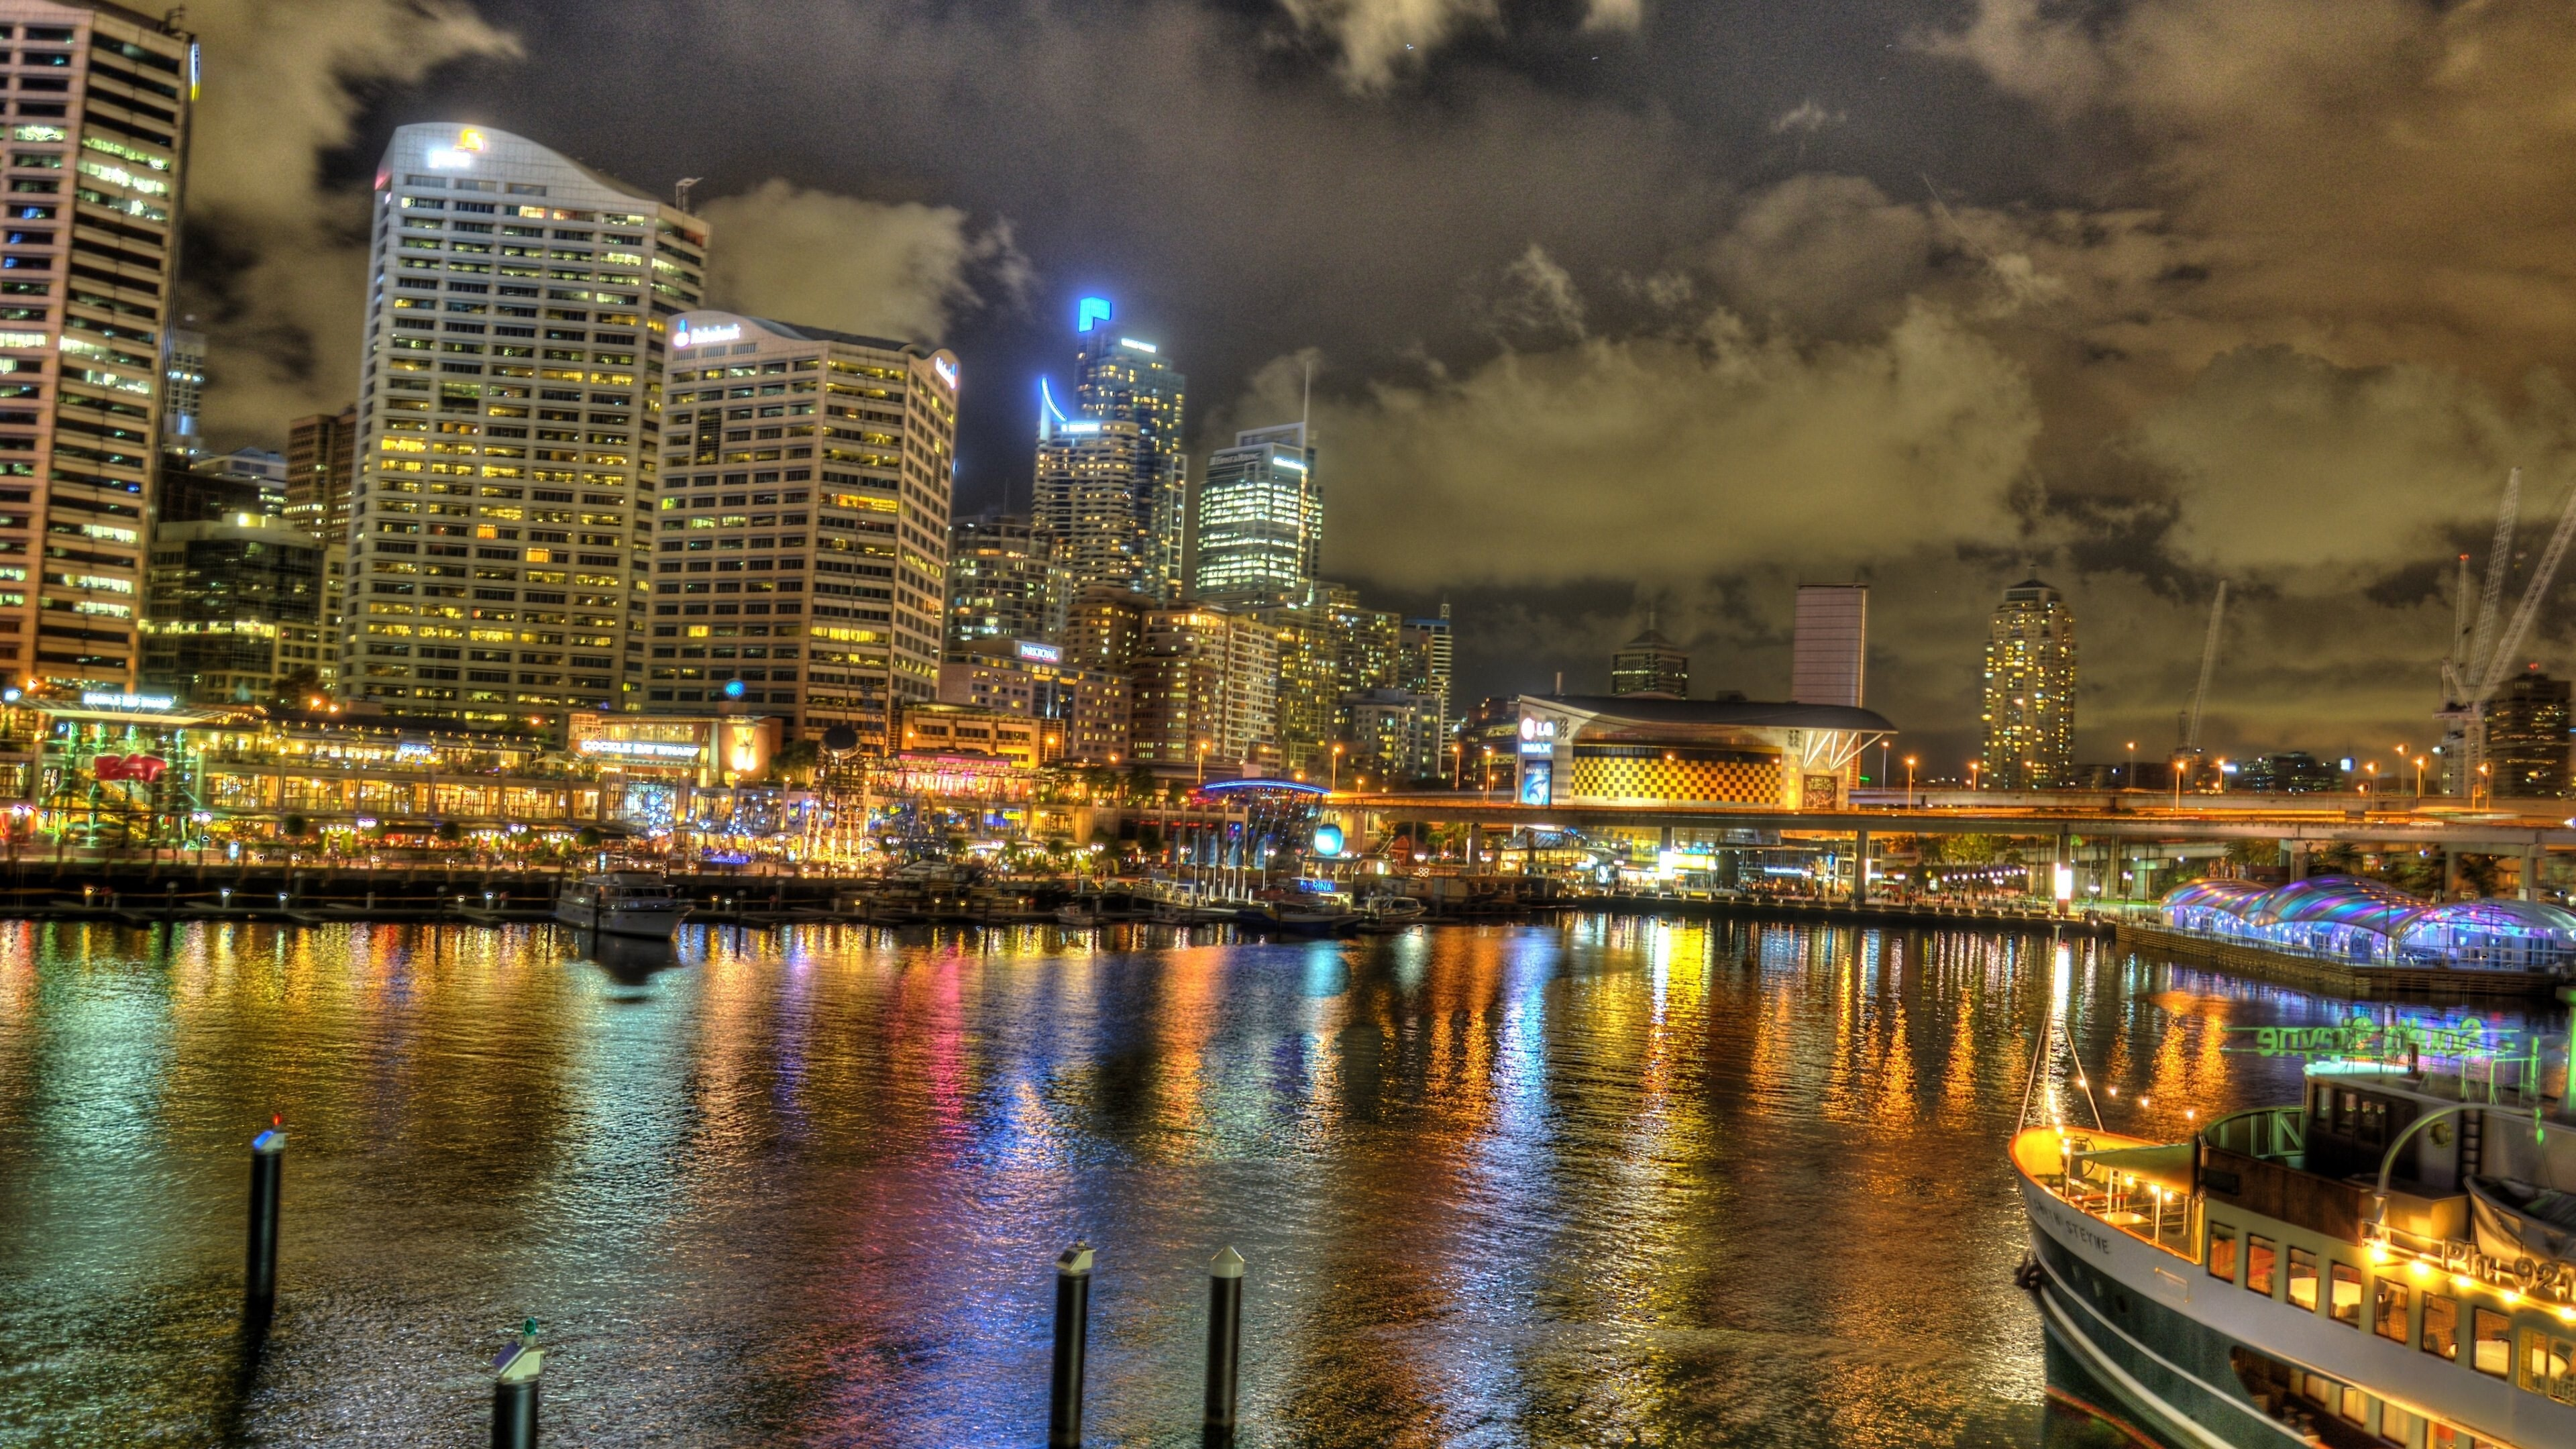 Darling Harbour In Sydney Australia Wallpapers